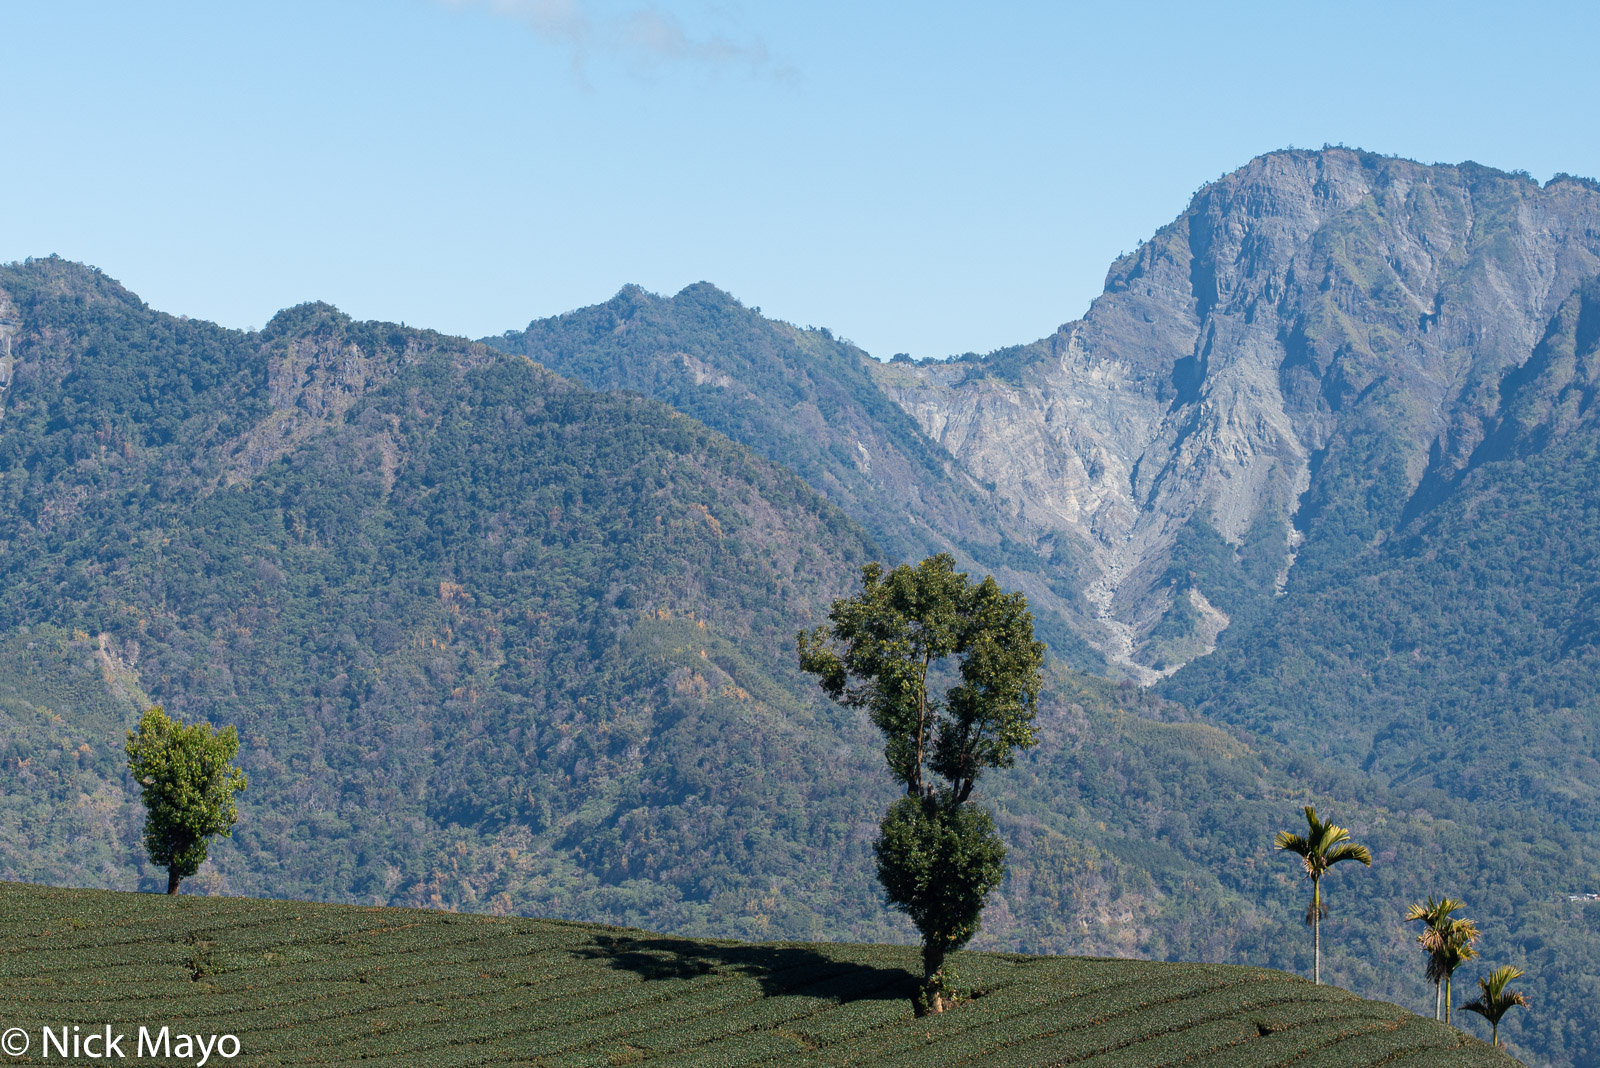 A tea field at Tai He in Chiayi County.